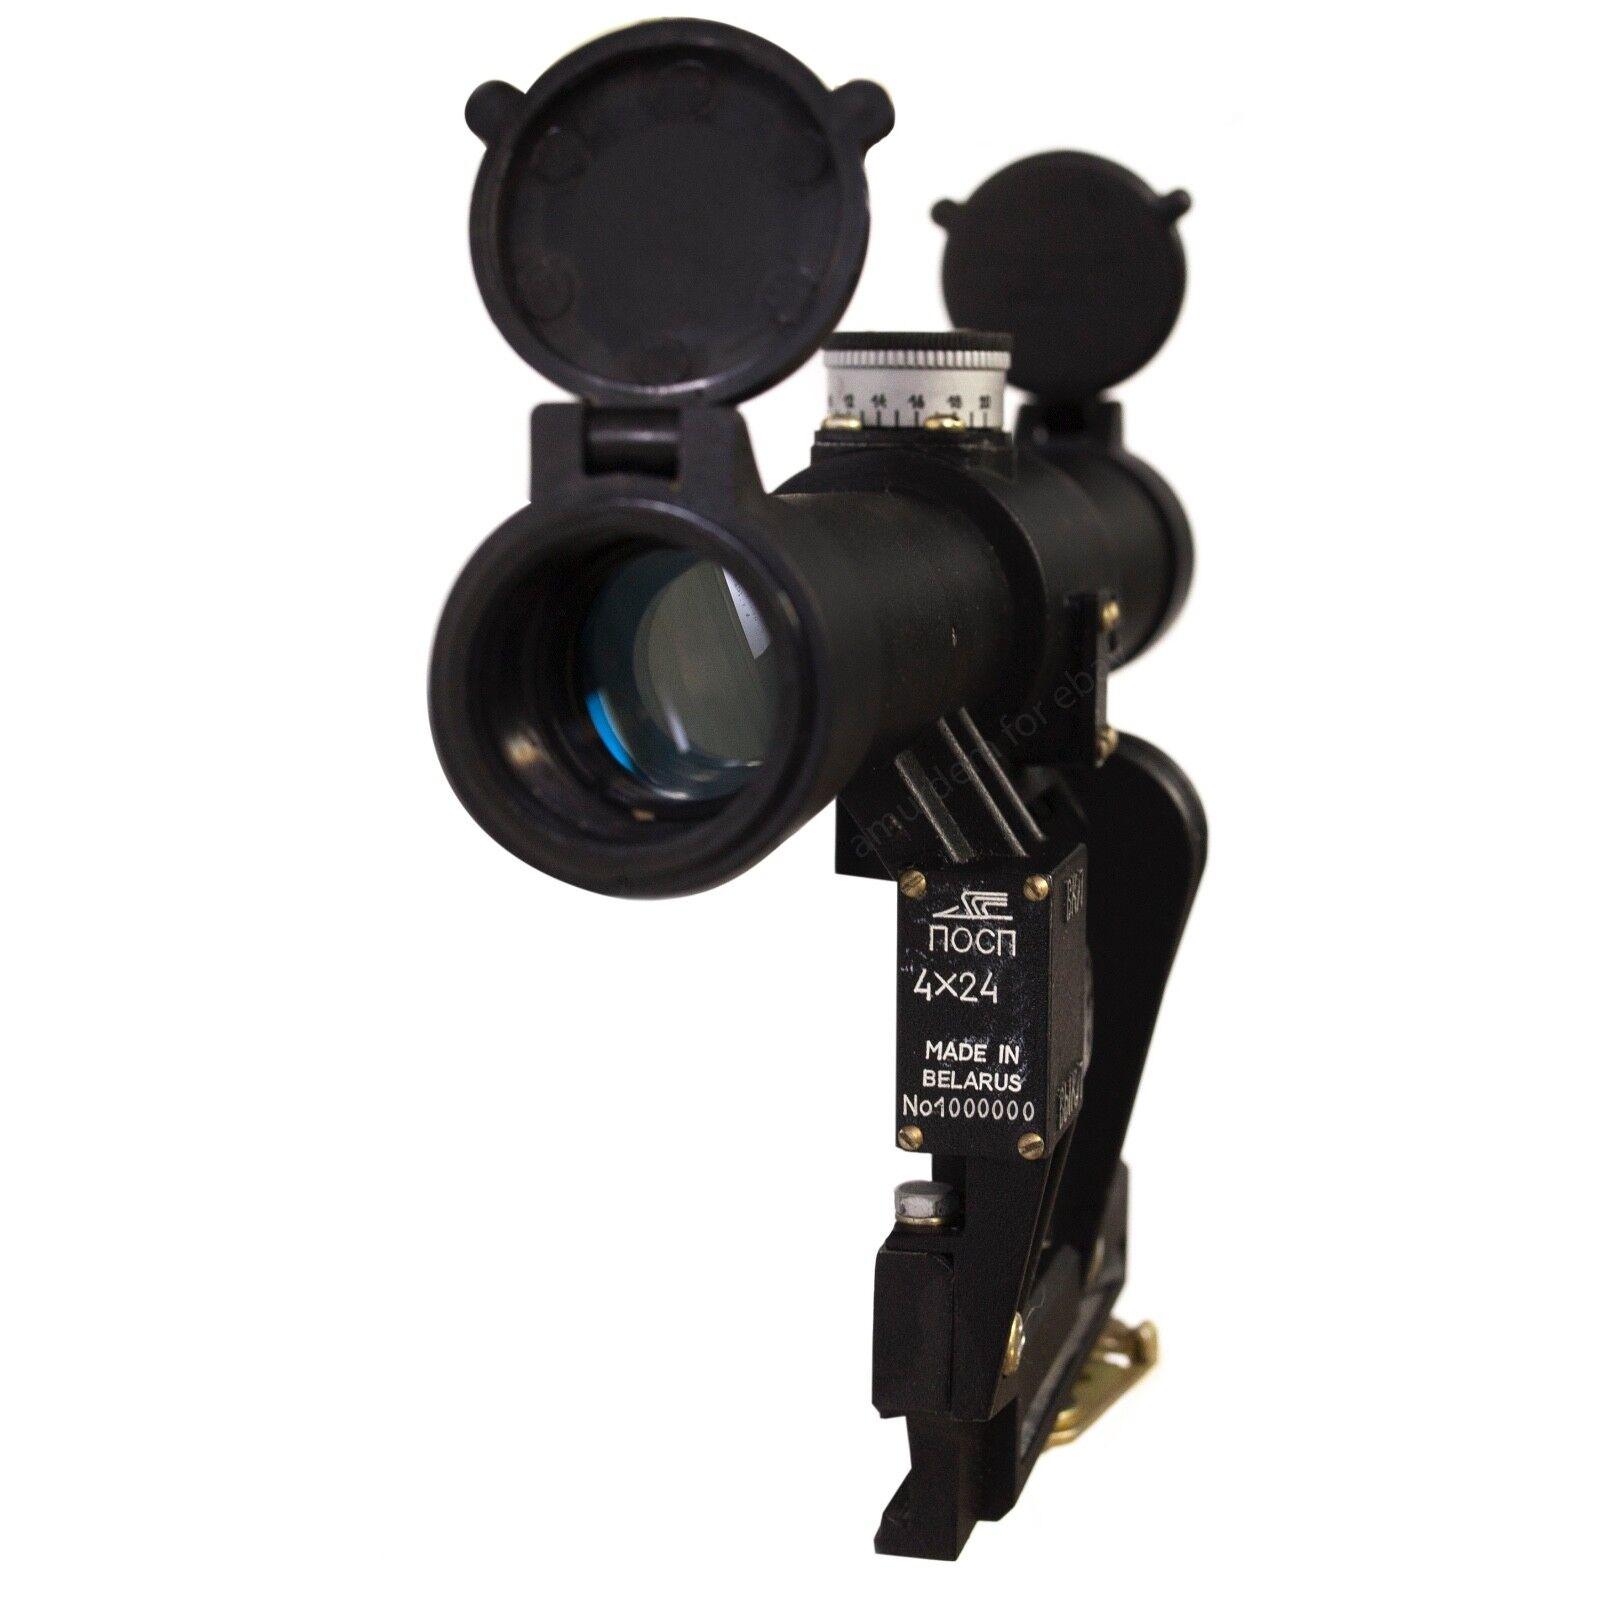 Zenit POSP POSP POSP alcance de 4x24. retícula iluminada. Cola De Milano de montaje lateral. fa67b0